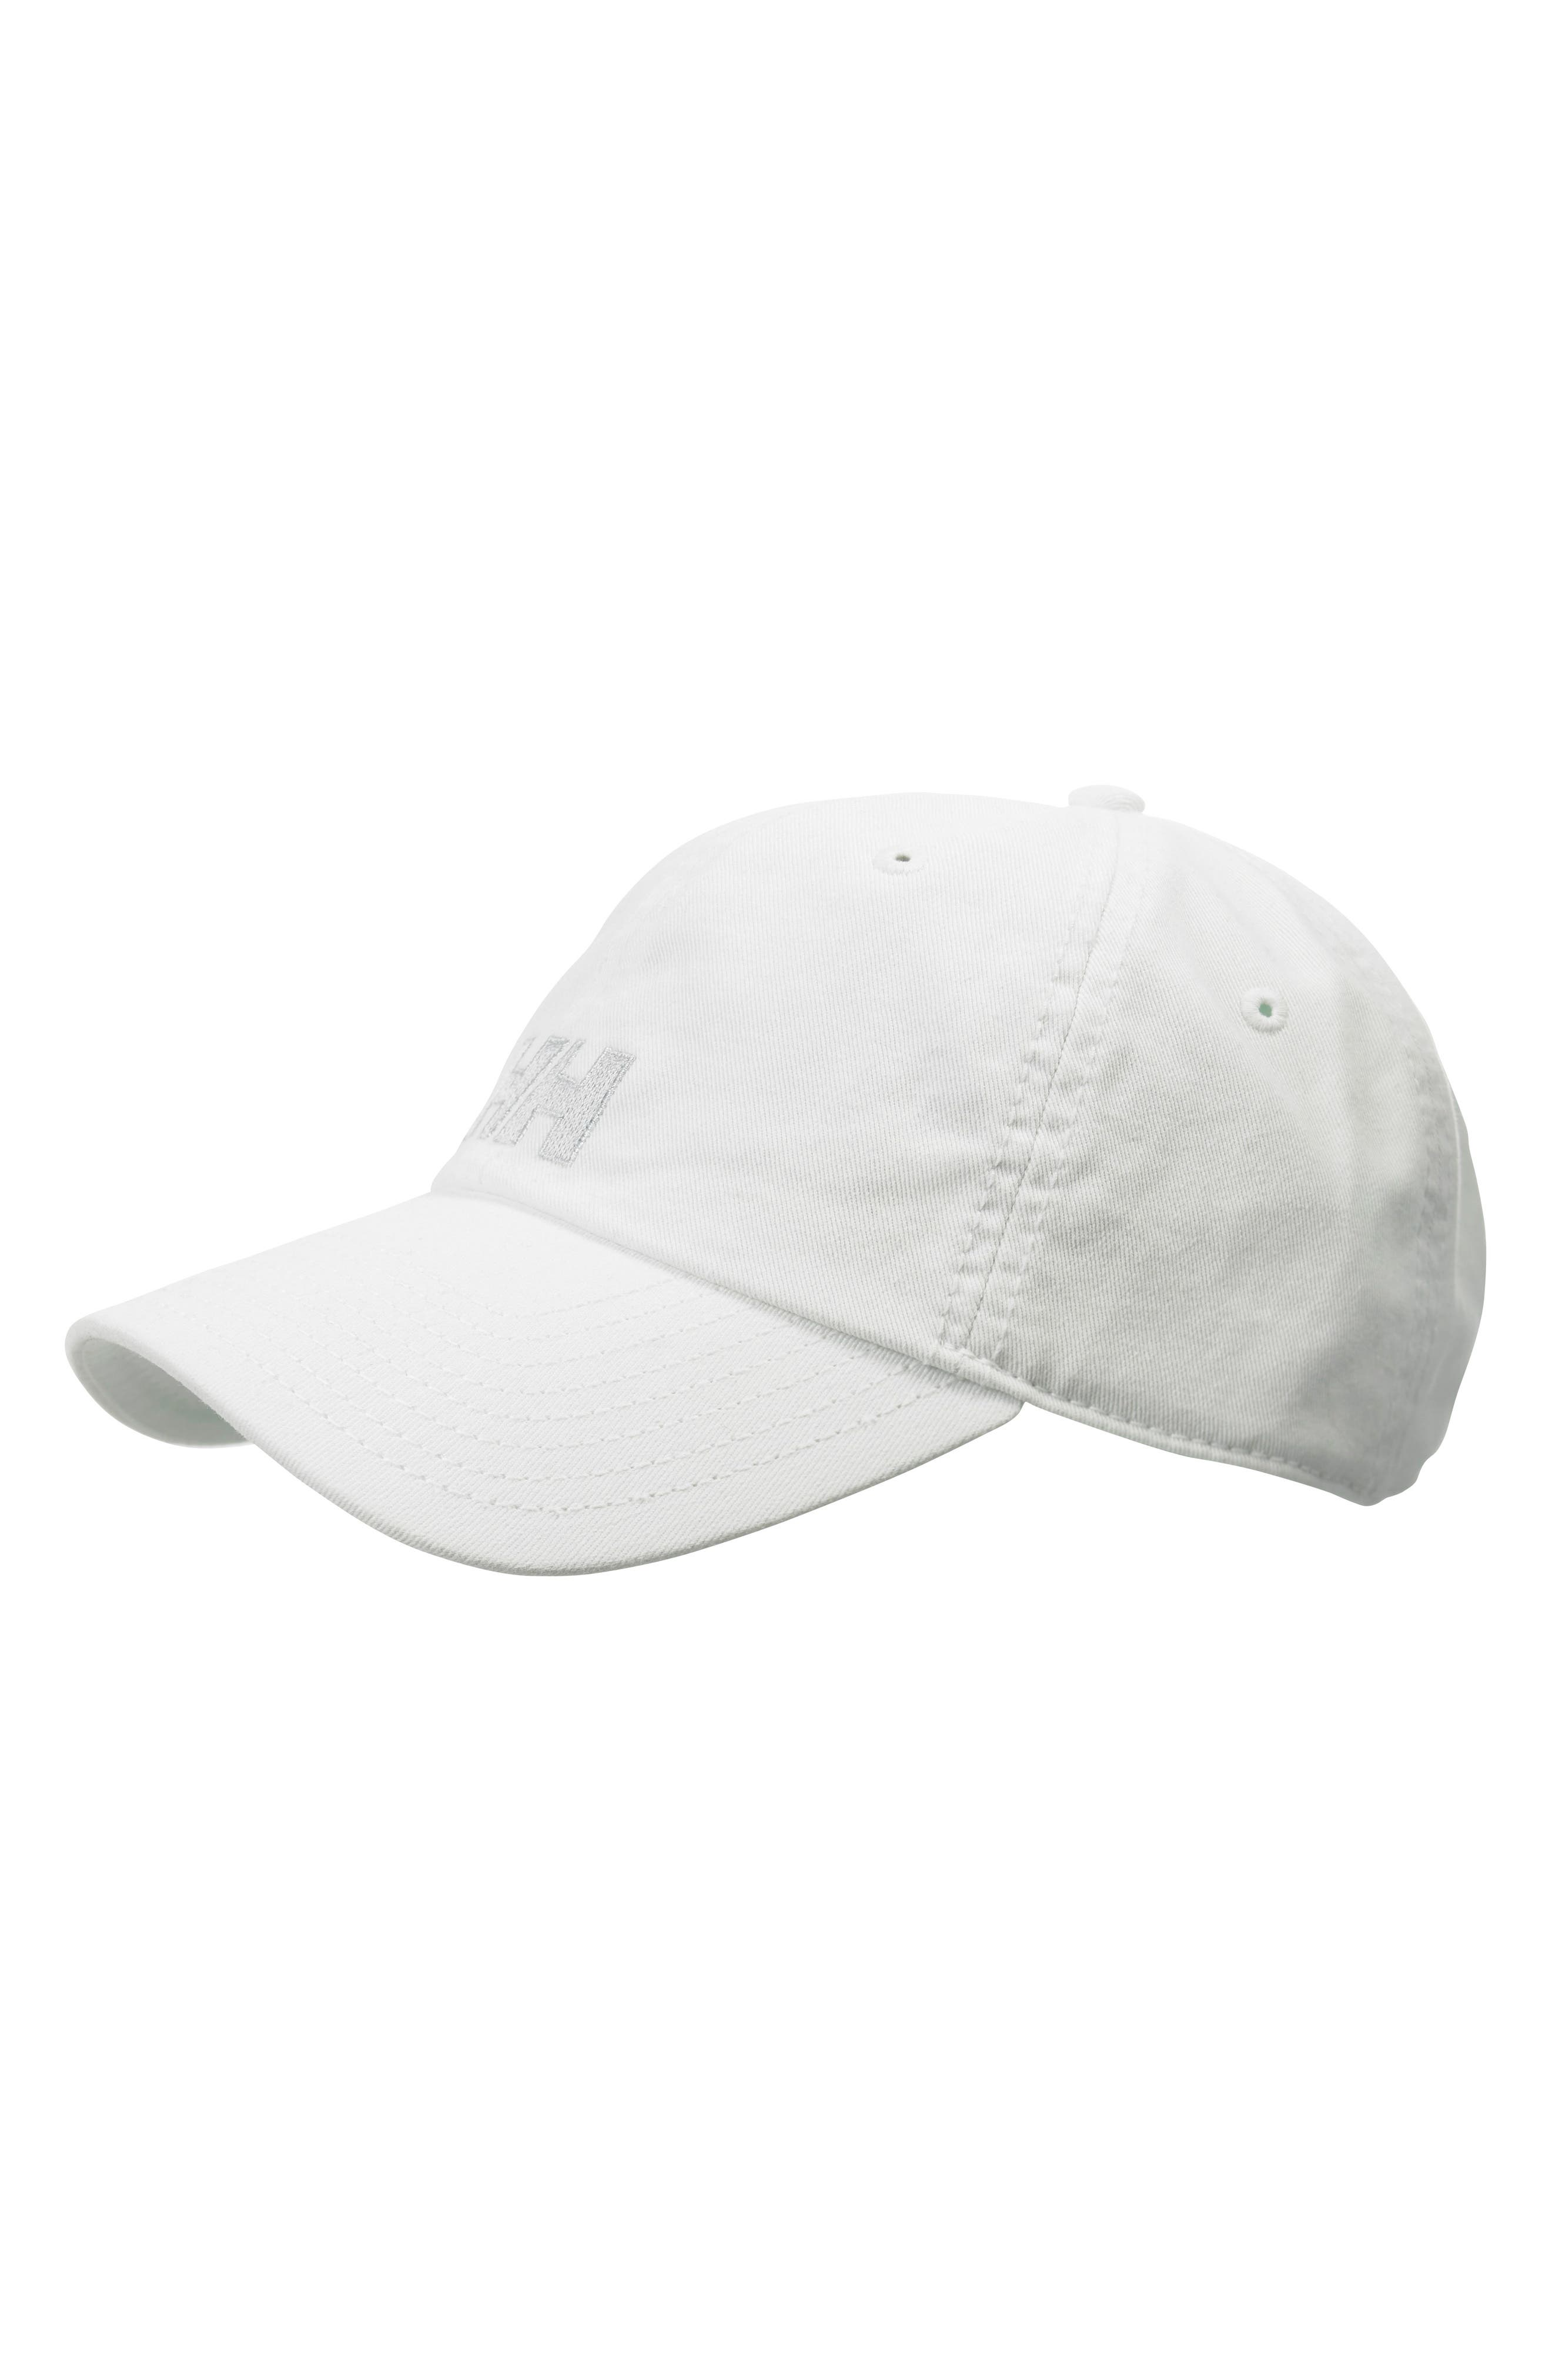 HELLY HANSEN Logo Baseball Cap - White